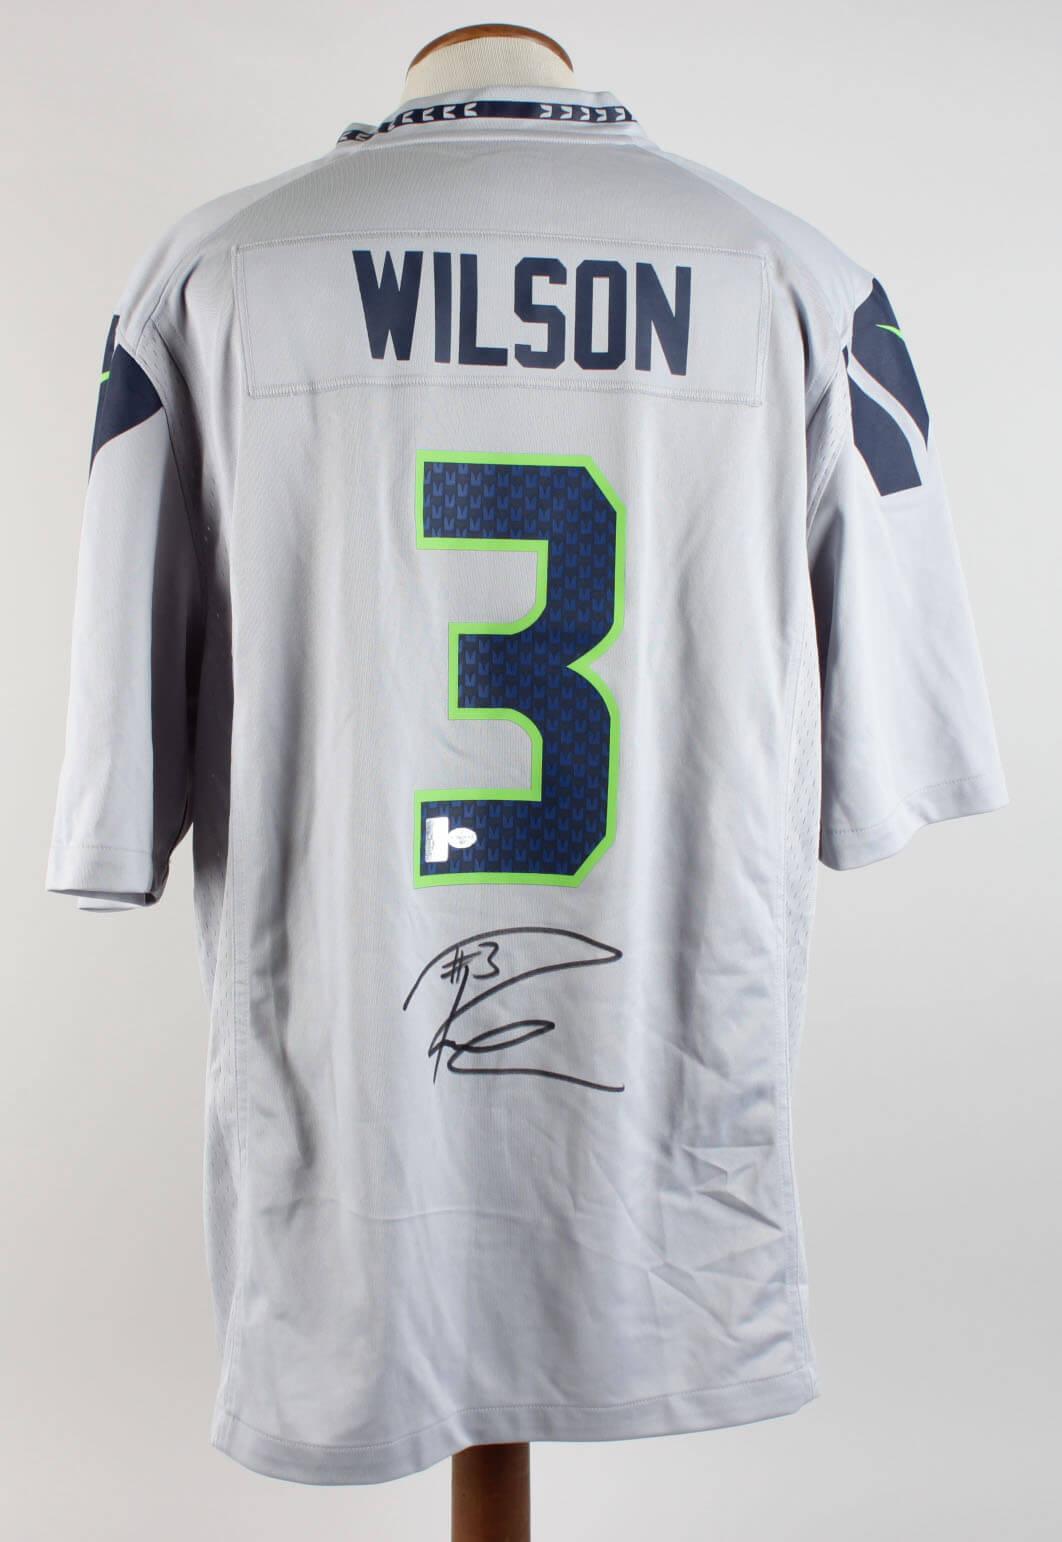 b08422b0d Seattle Seahawks - Russell Wilson Signed Jersey (Wilson Hologram). Seattle  Seahawks - Russell Wilson Signed Jersey (Wilson Hologram)